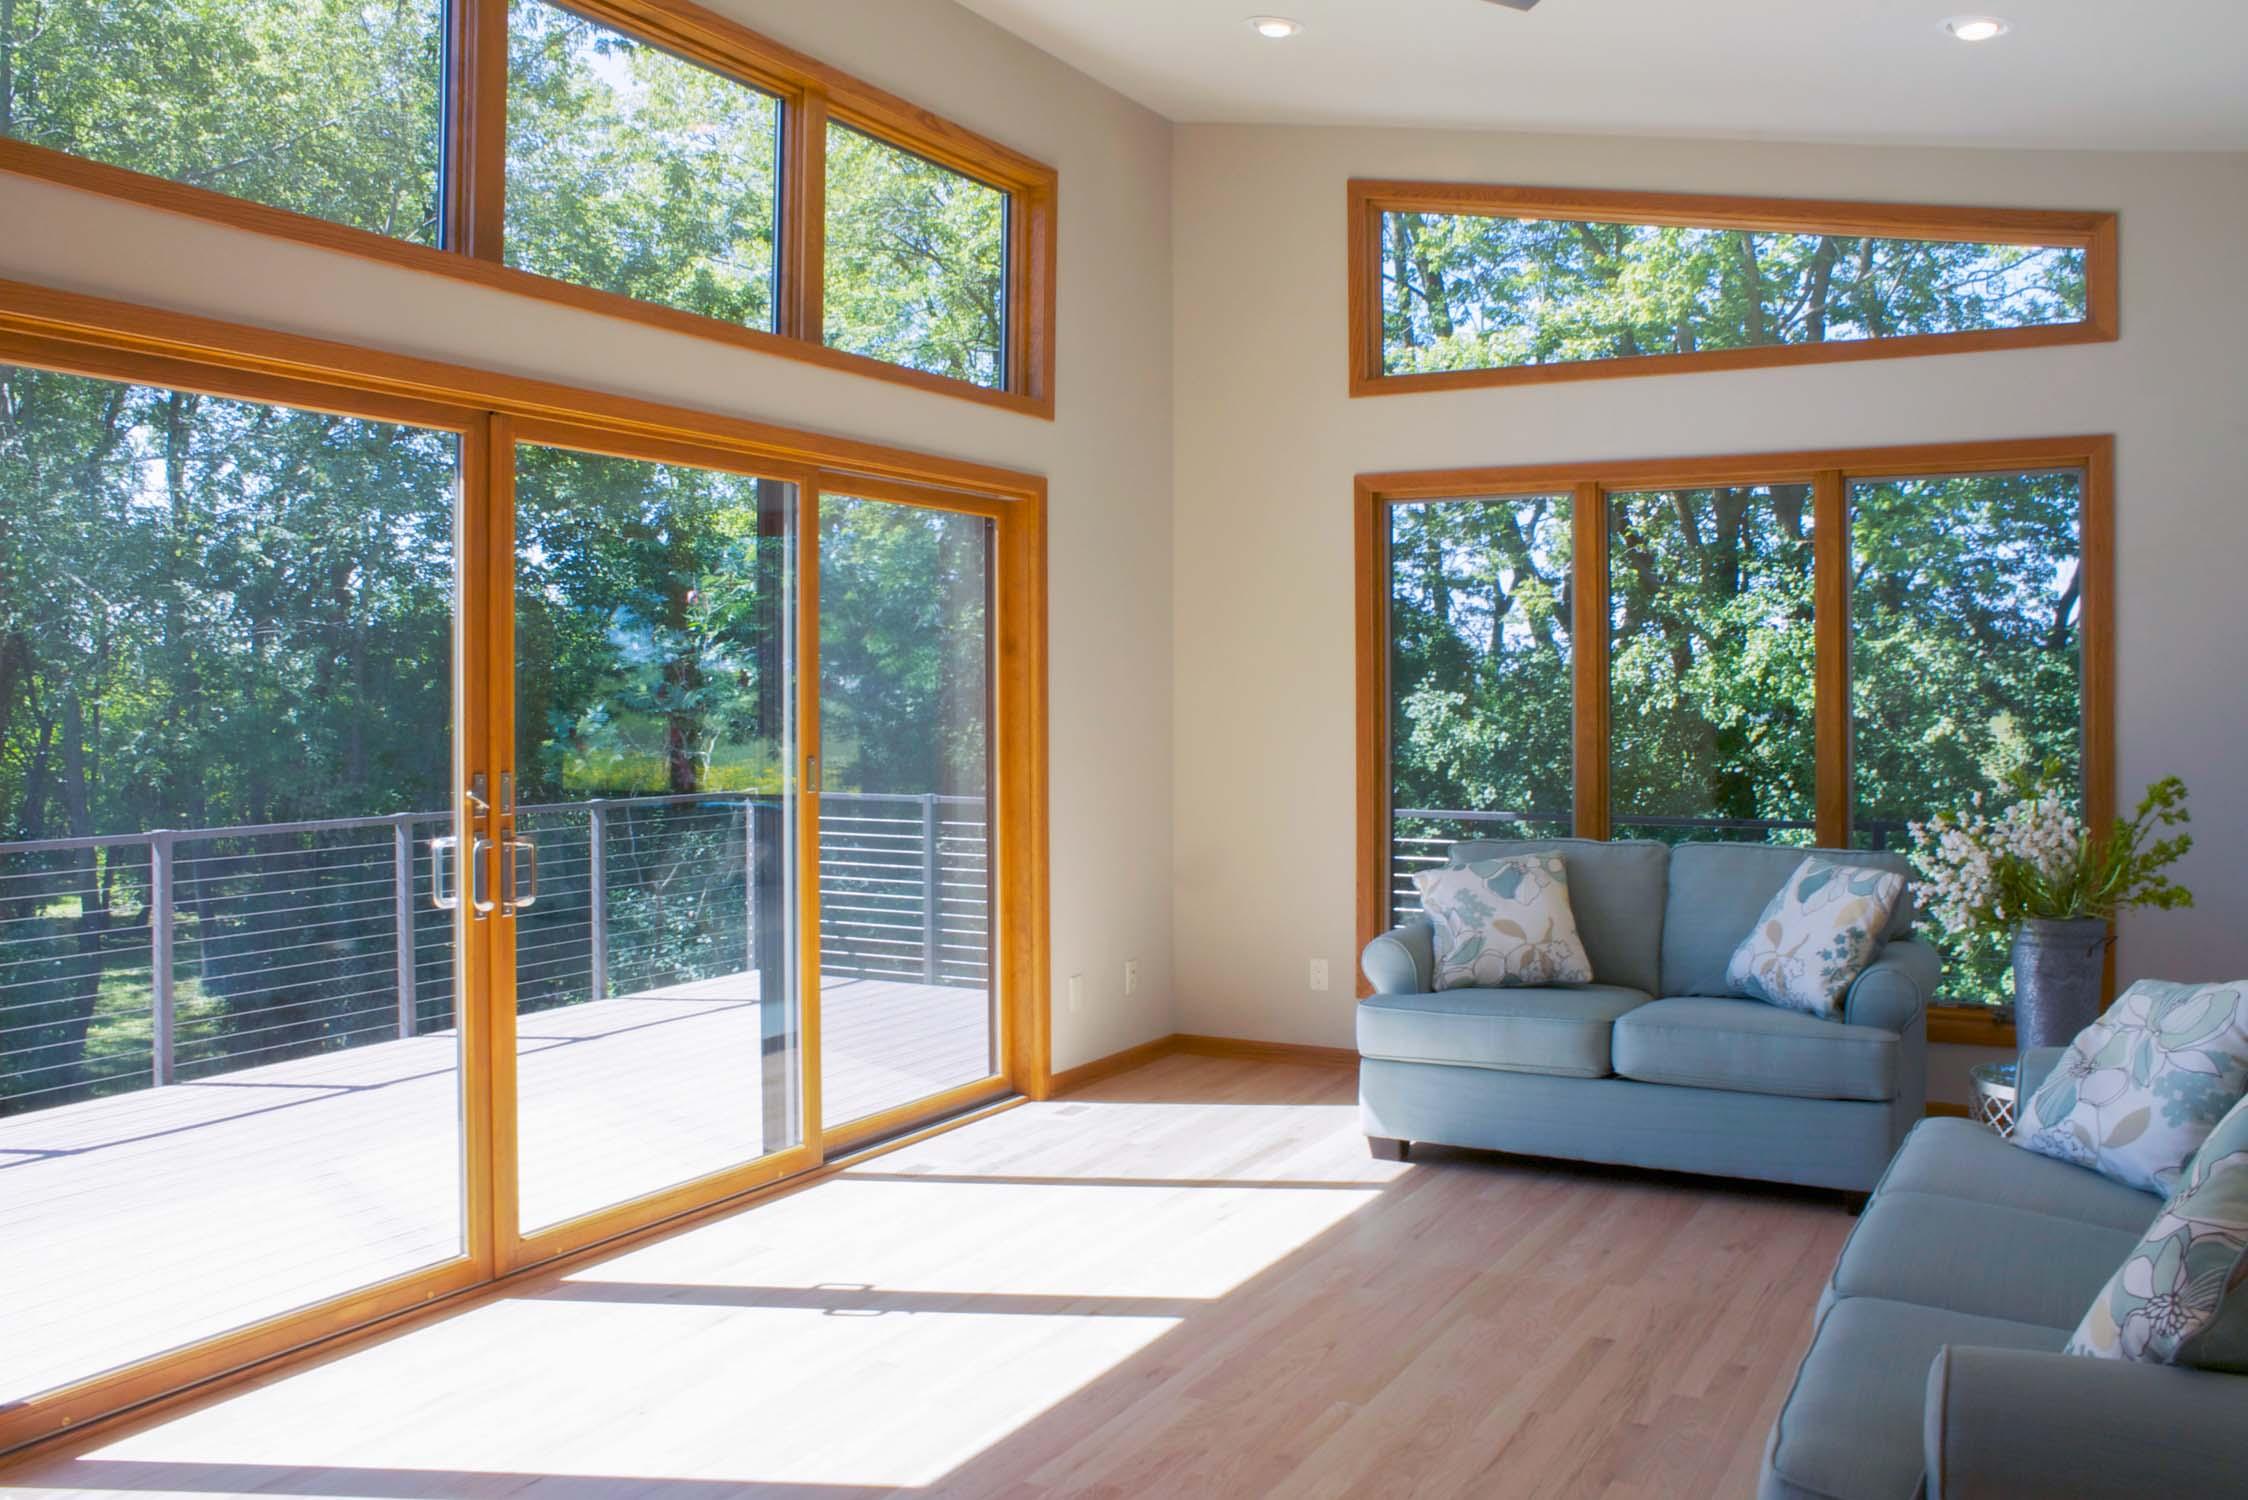 Sunroom with Oversized Windows